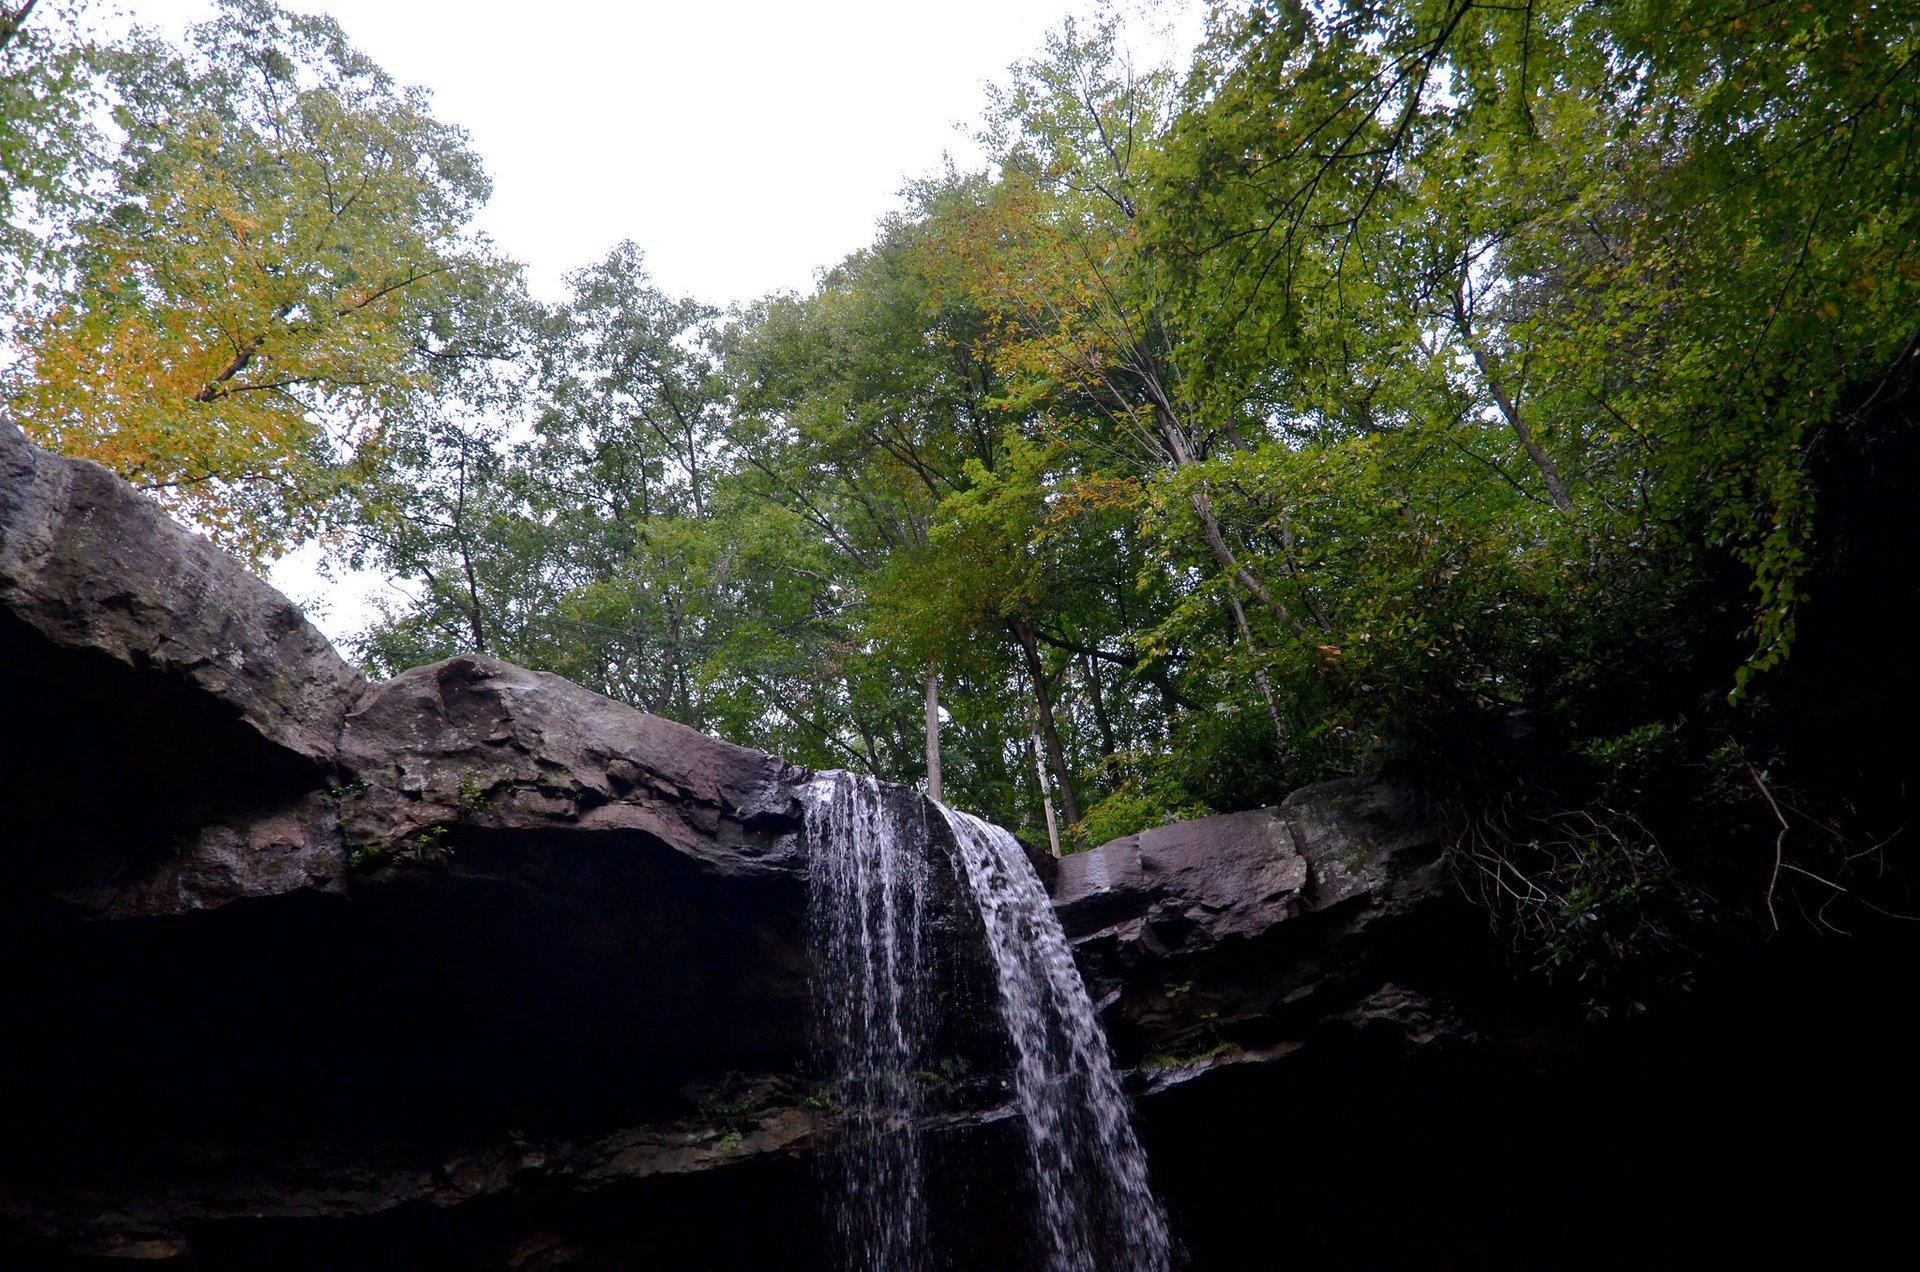 Cucumber Falls in Ohiopyle State Park, Pennsylvania 2020